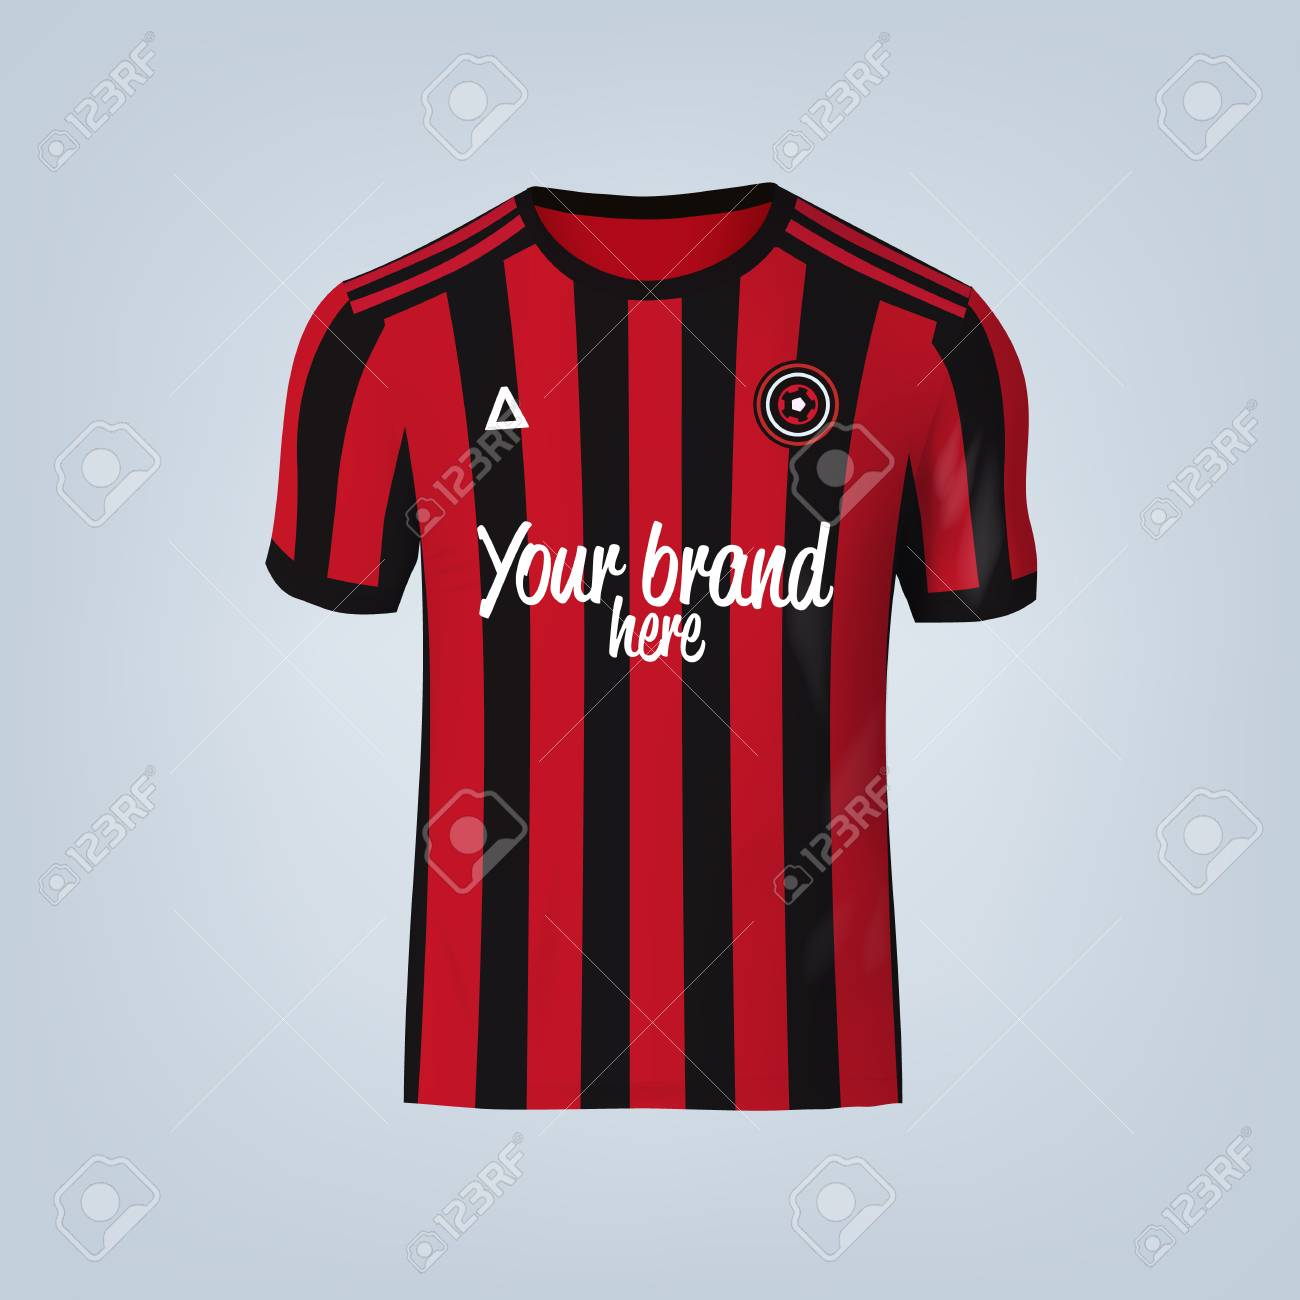 Vector illustration of football t-shirt template. - 84013135